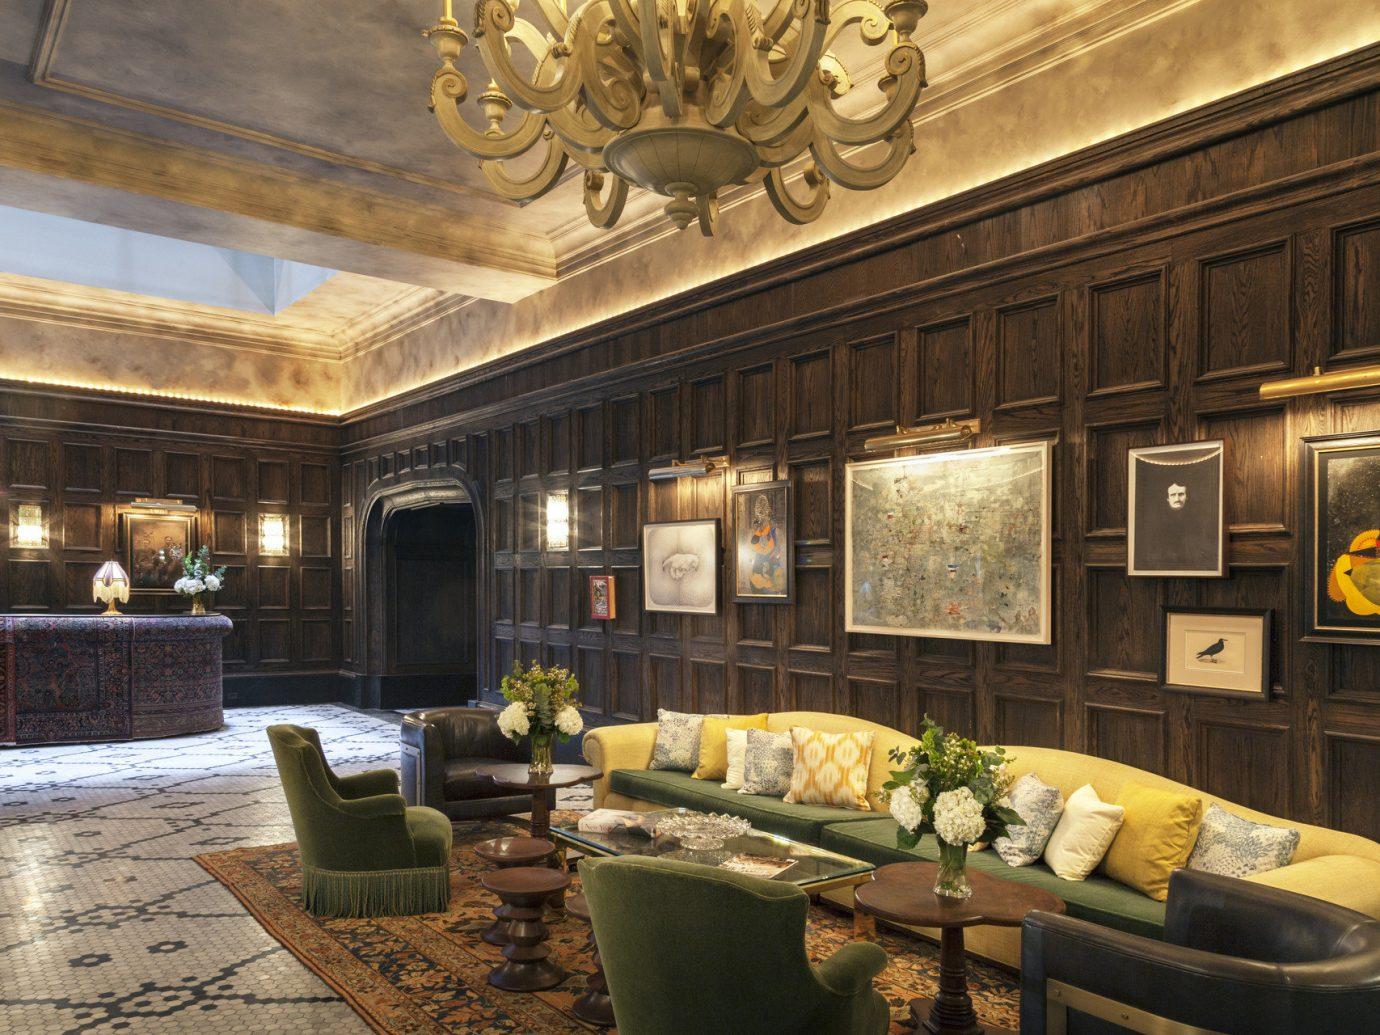 Hotels indoor Lobby room property Living estate living room mansion interior design home real estate palace Design furniture stone